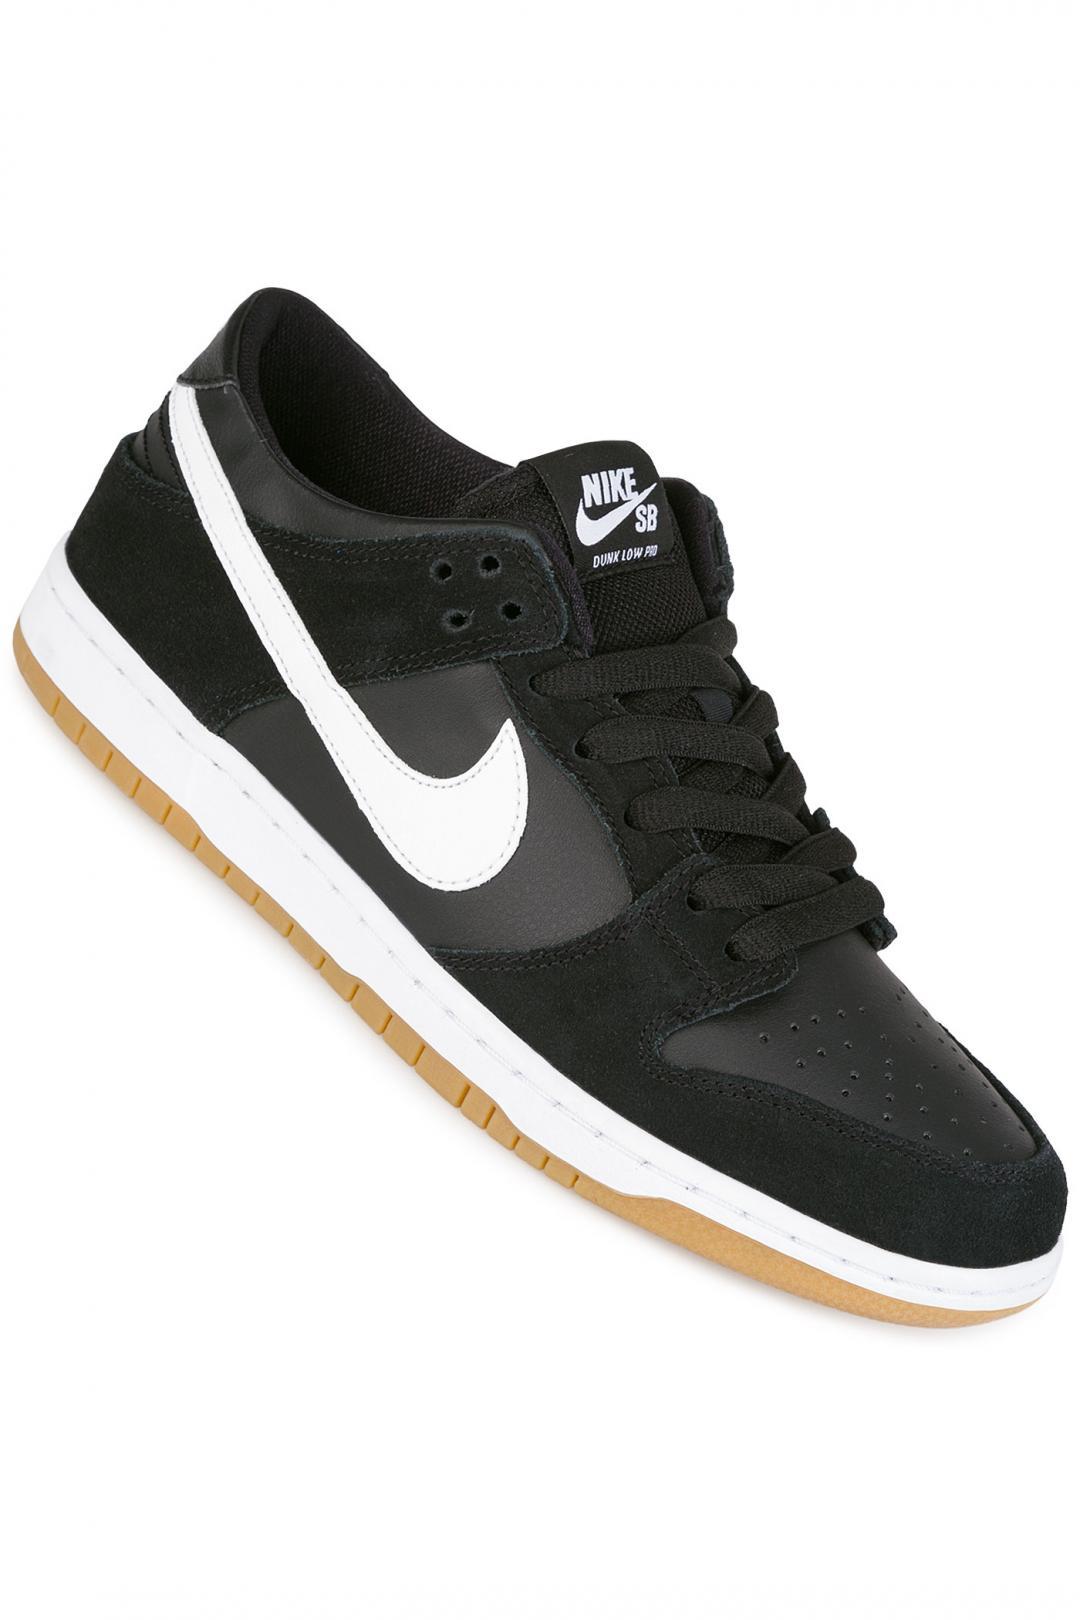 Uomo Nike SB Dunk Low Pro black white gum | Sneakers low top